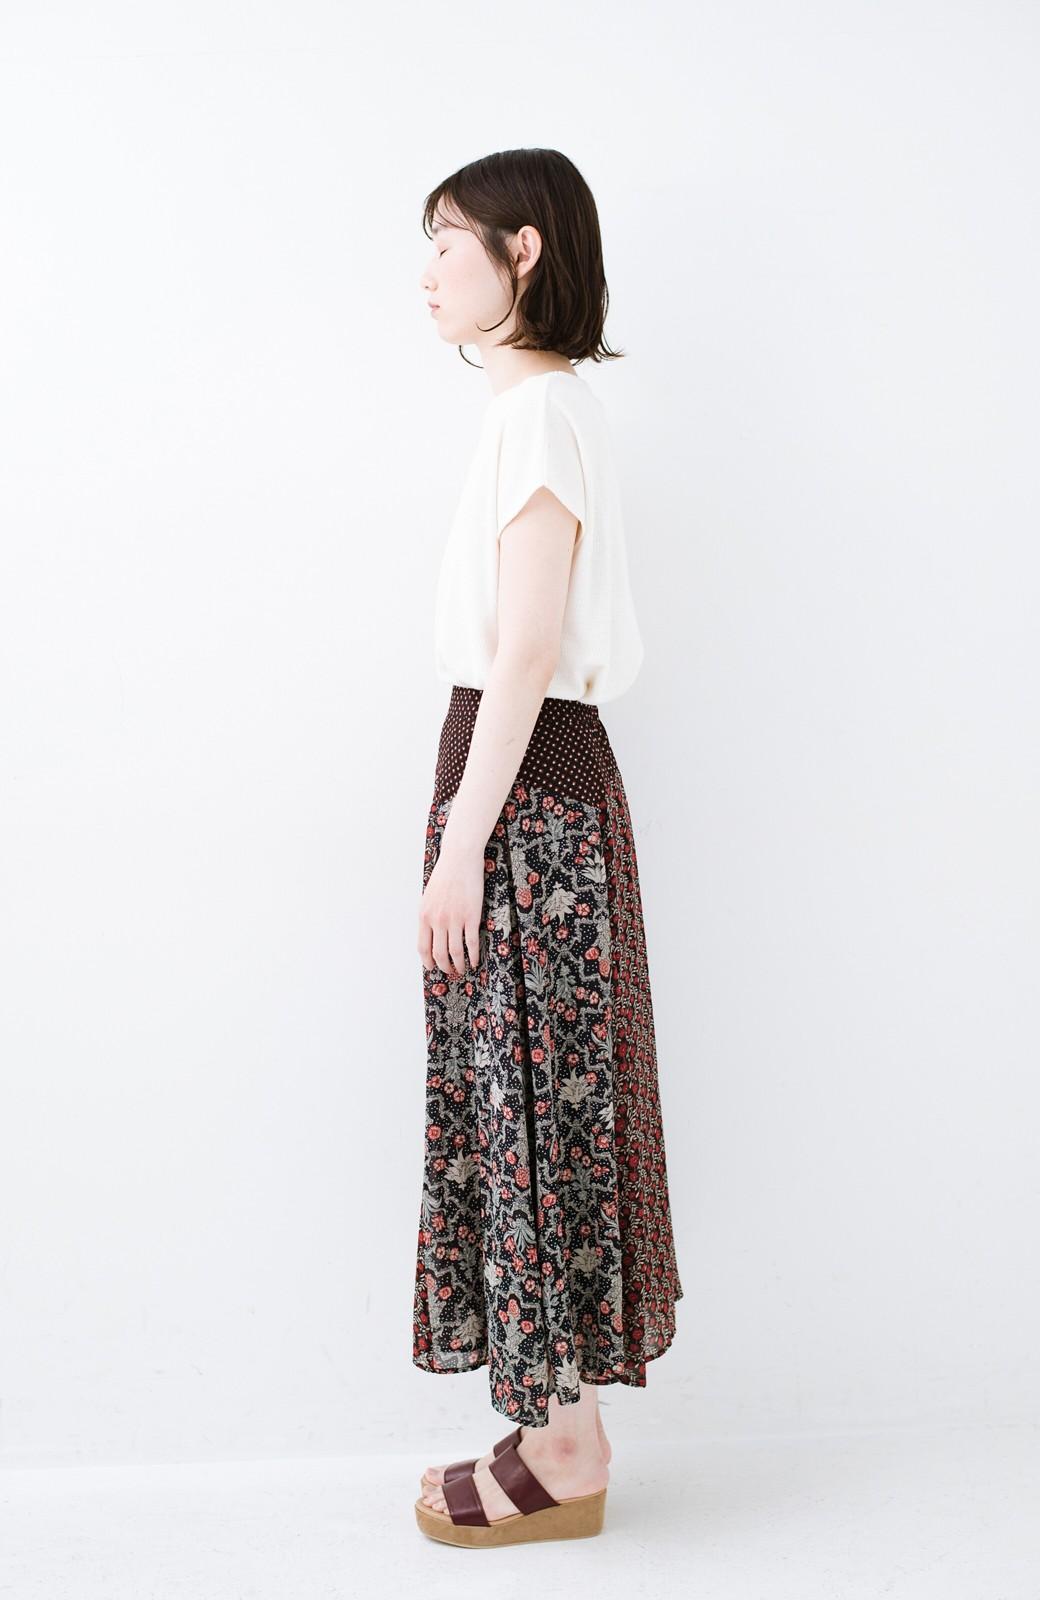 haco! 【洗濯機洗いOK】シンプルなトップスに合わせるだけでかわいくなれる MIX柄スカート <ブラック系その他>の商品写真13